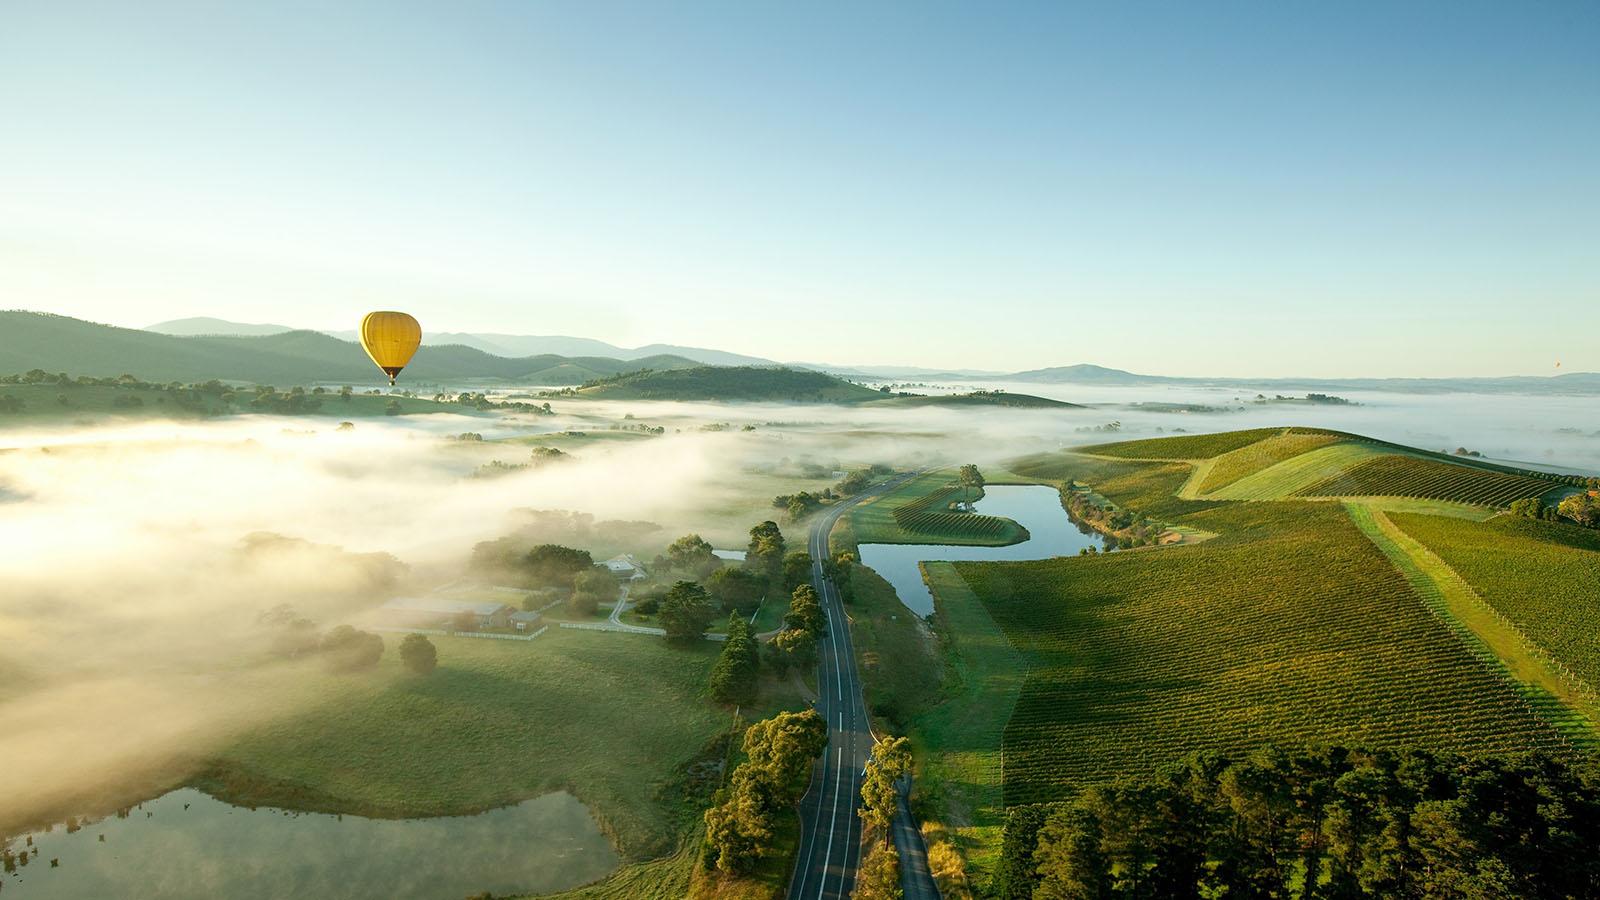 Hot air balloon, Yarra Valley & Dandenong Ranges, Victoria, Australia